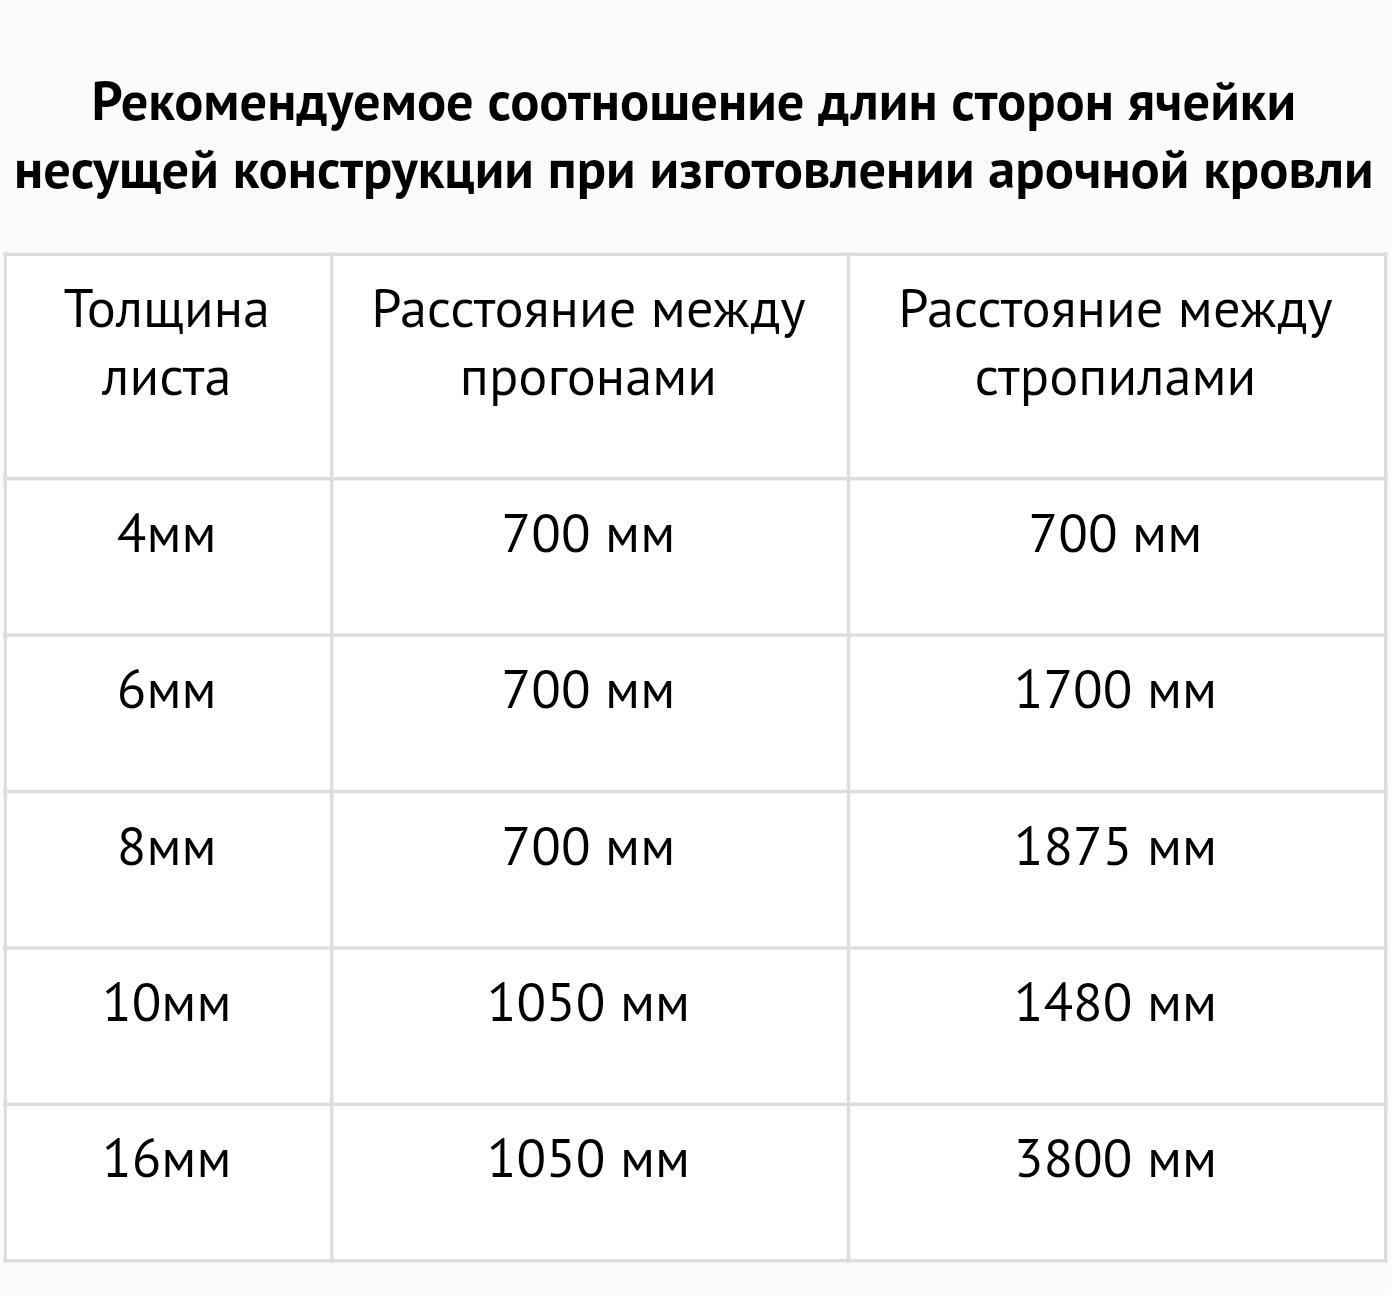 http://ecopoli.ru/images/upload/Screenshot_2017-12-06-13-44-03.png